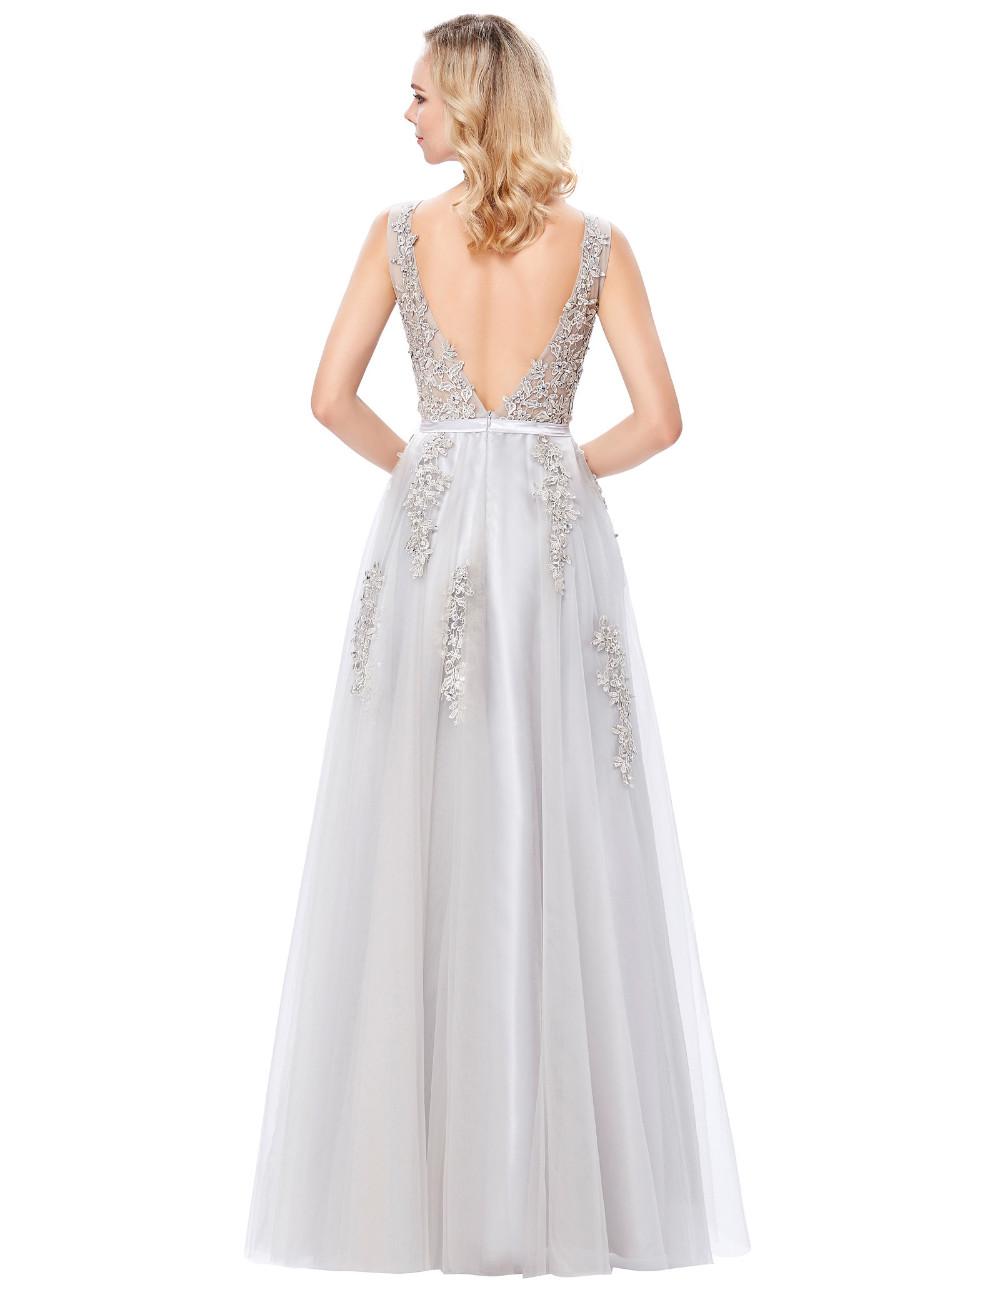 Grace Karin Tulle Appliques Celebrity Prom Dress Sexy V Back Sleeveless Long Royal Blue Robes De Soiree 2017 Longue Prom Dresses 24